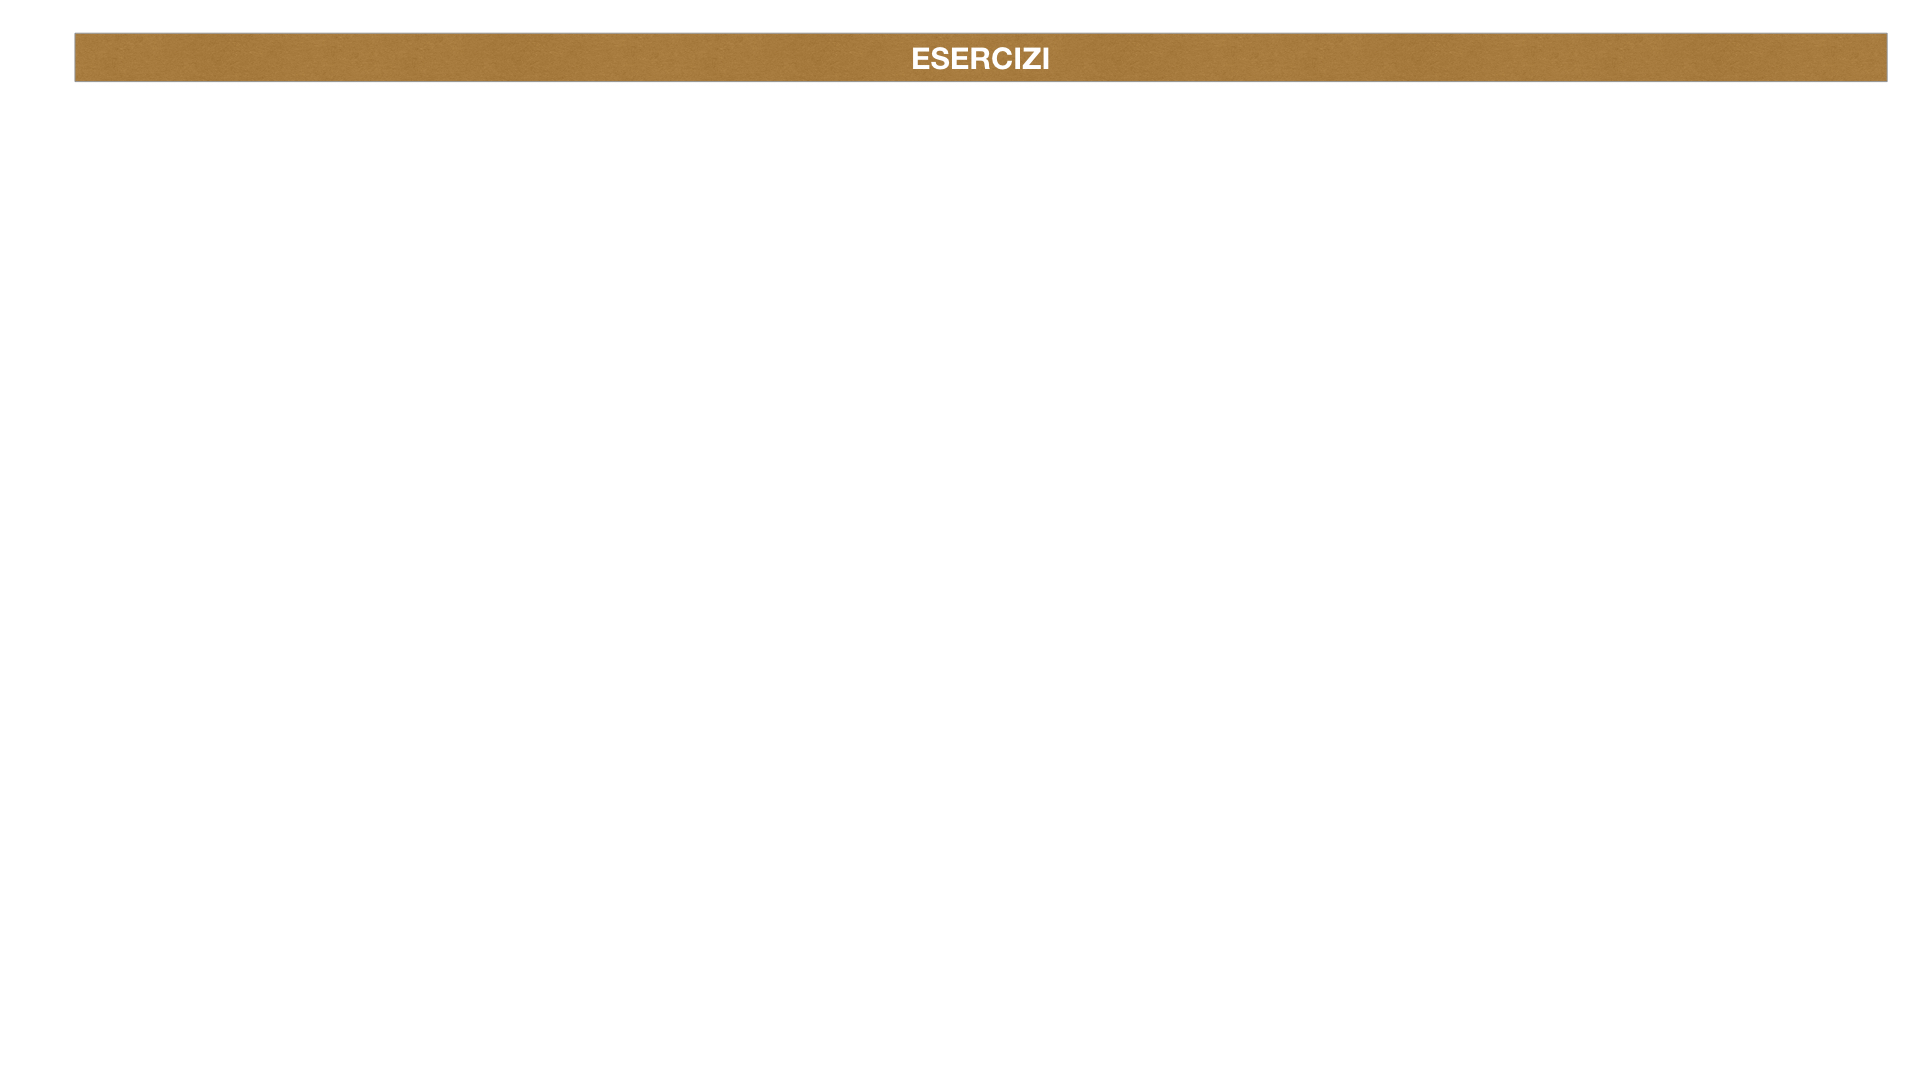 PERCENTUALE ESERCIZI_SIMULAZIONE.206